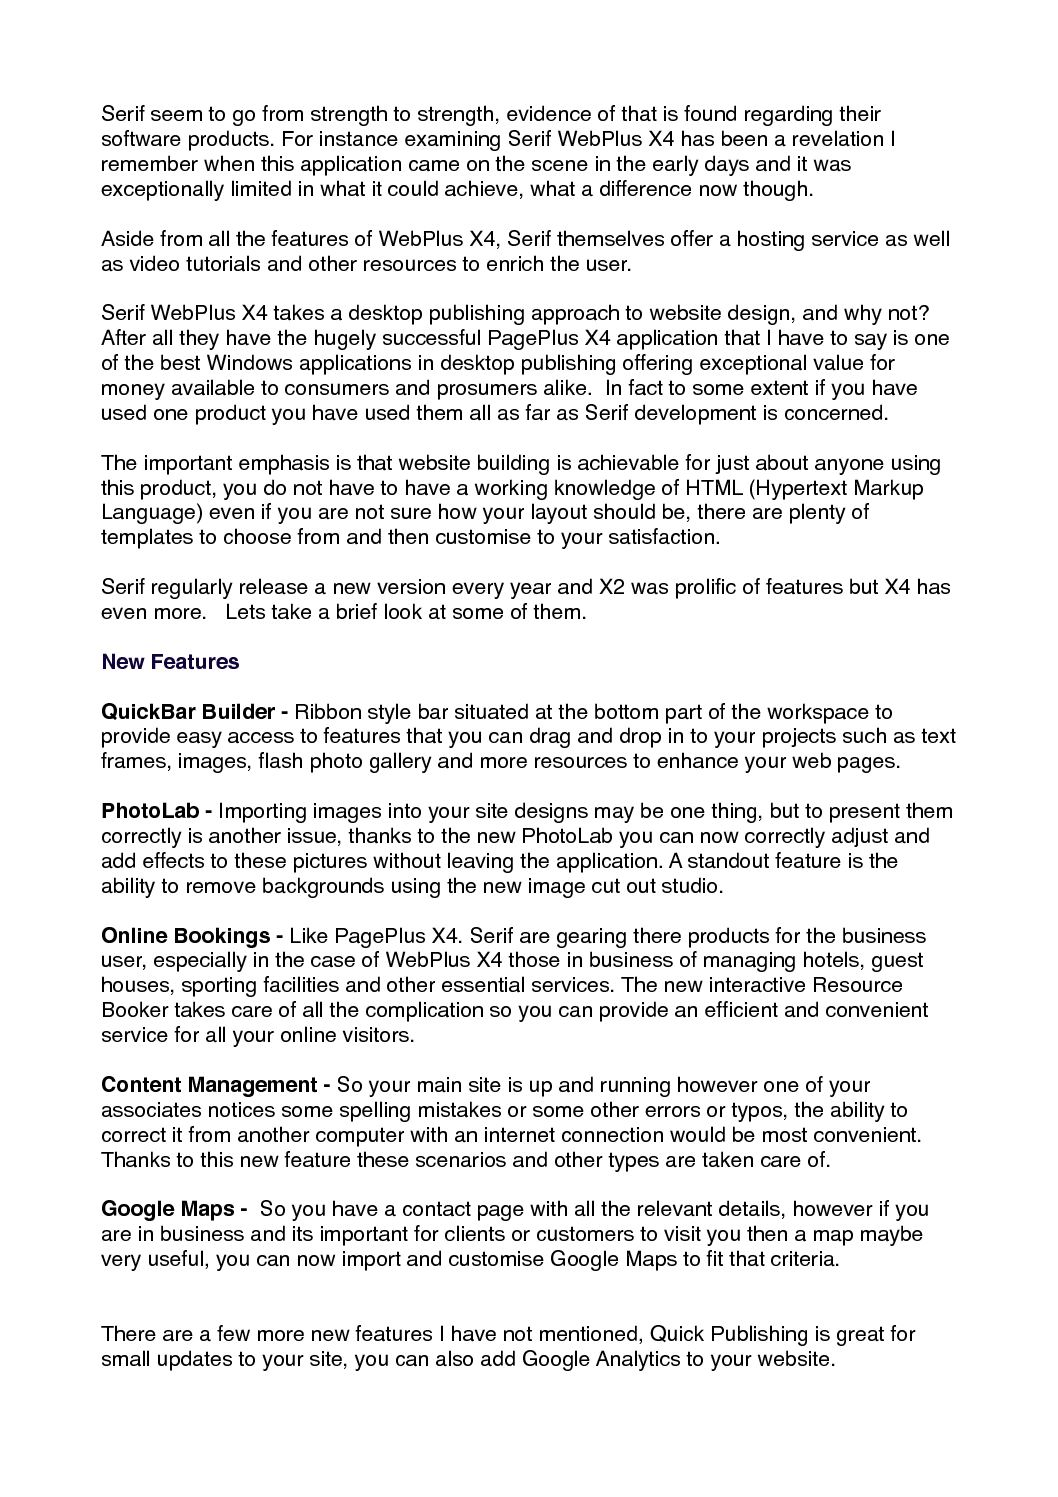 Calaméo - WebPlus X4 Review